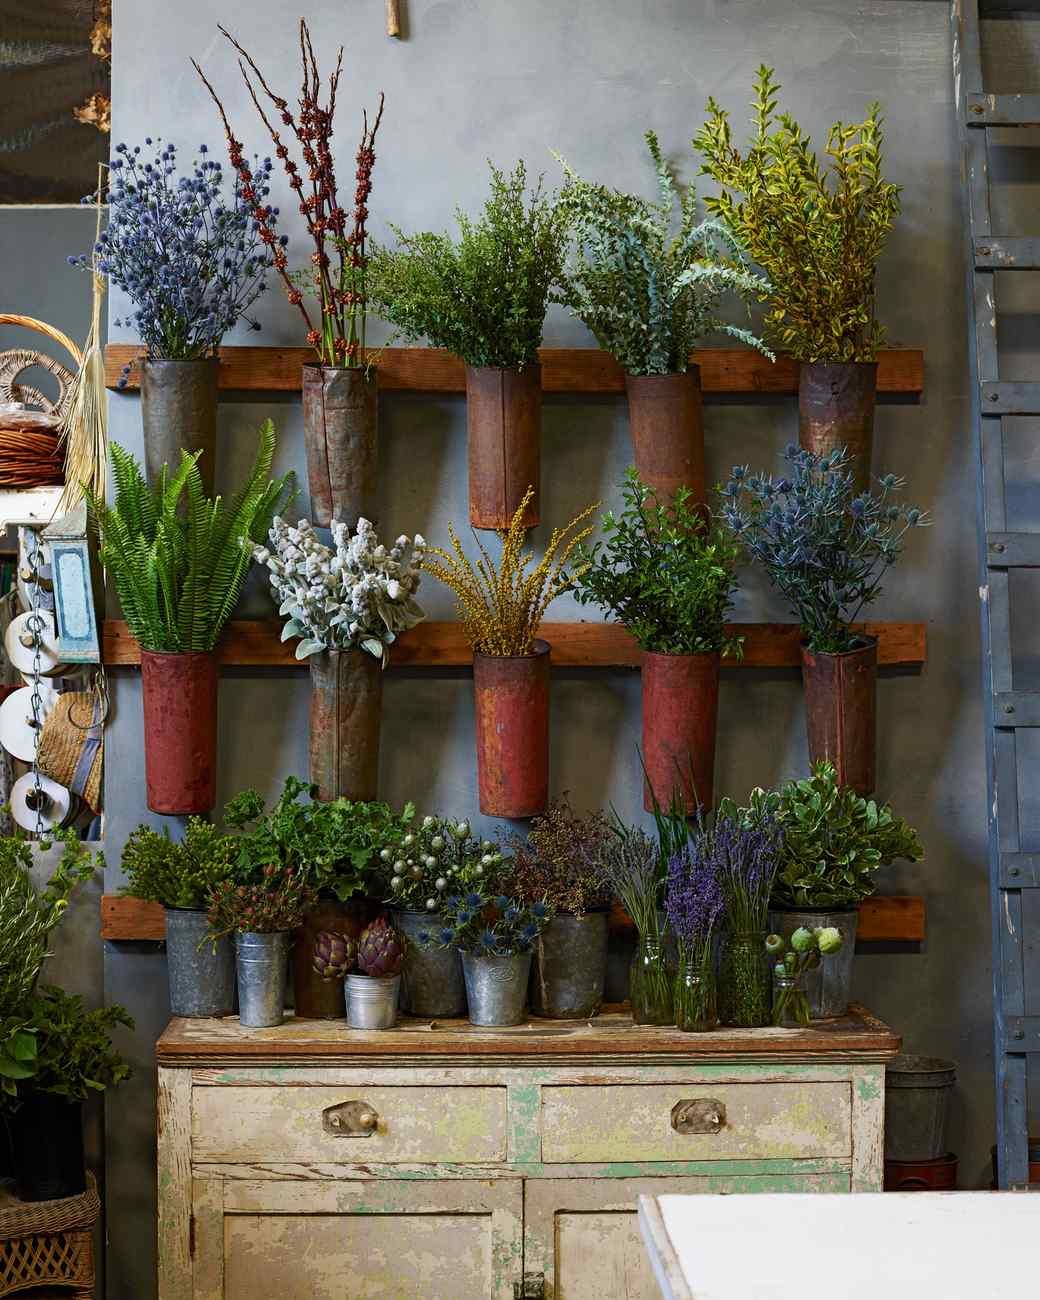 dandelion-ranch-clover-chadwick-wall-003-d112251.jpg